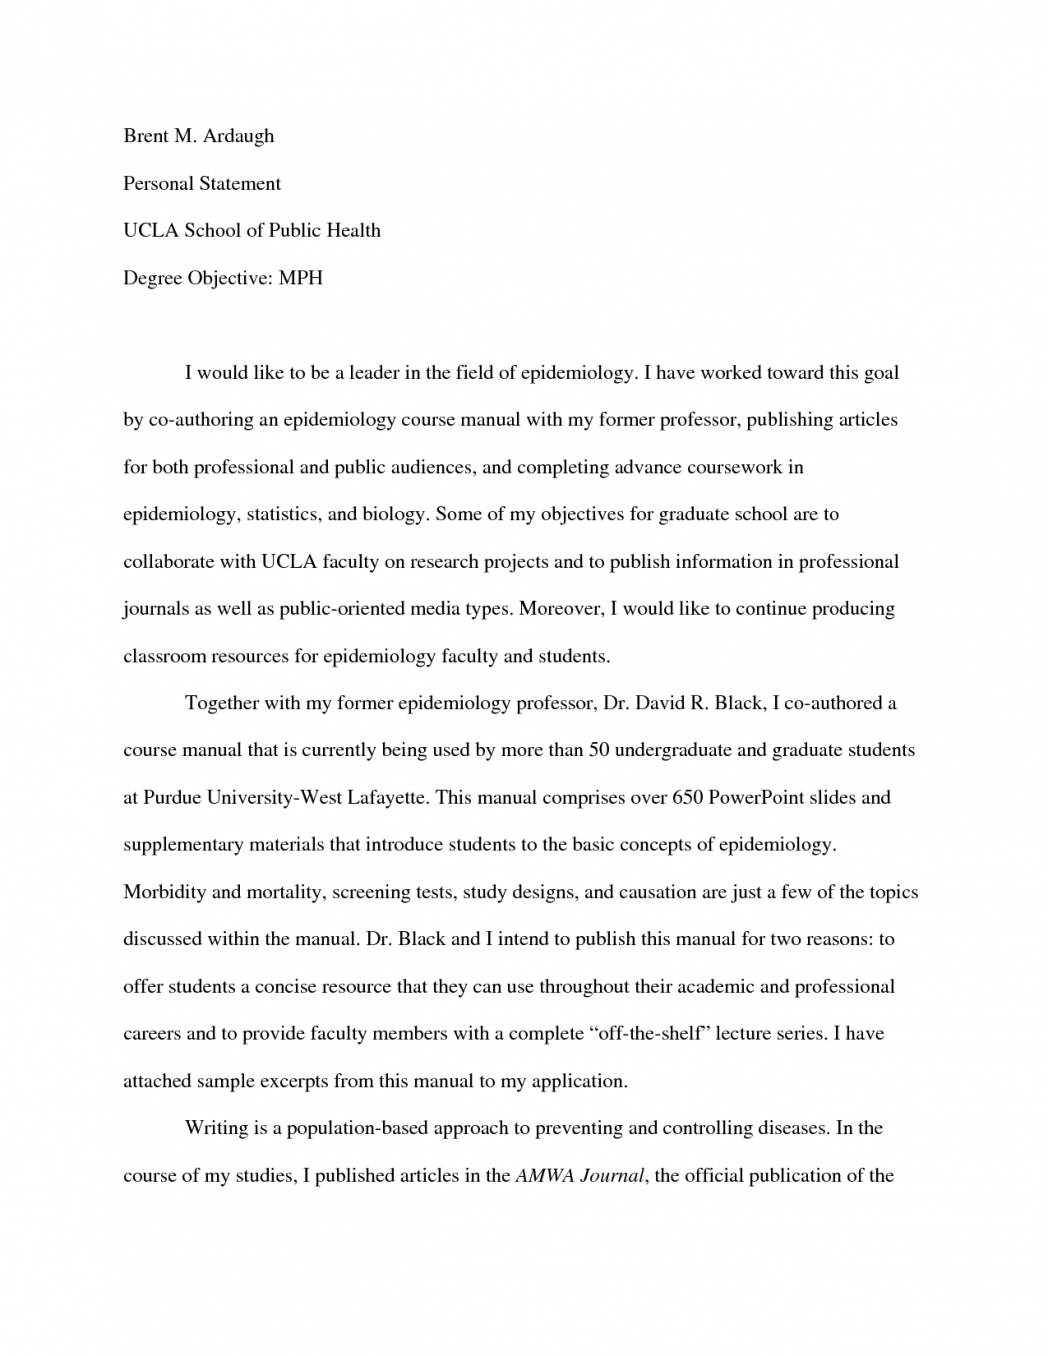 Ohio state university admission essay prompt